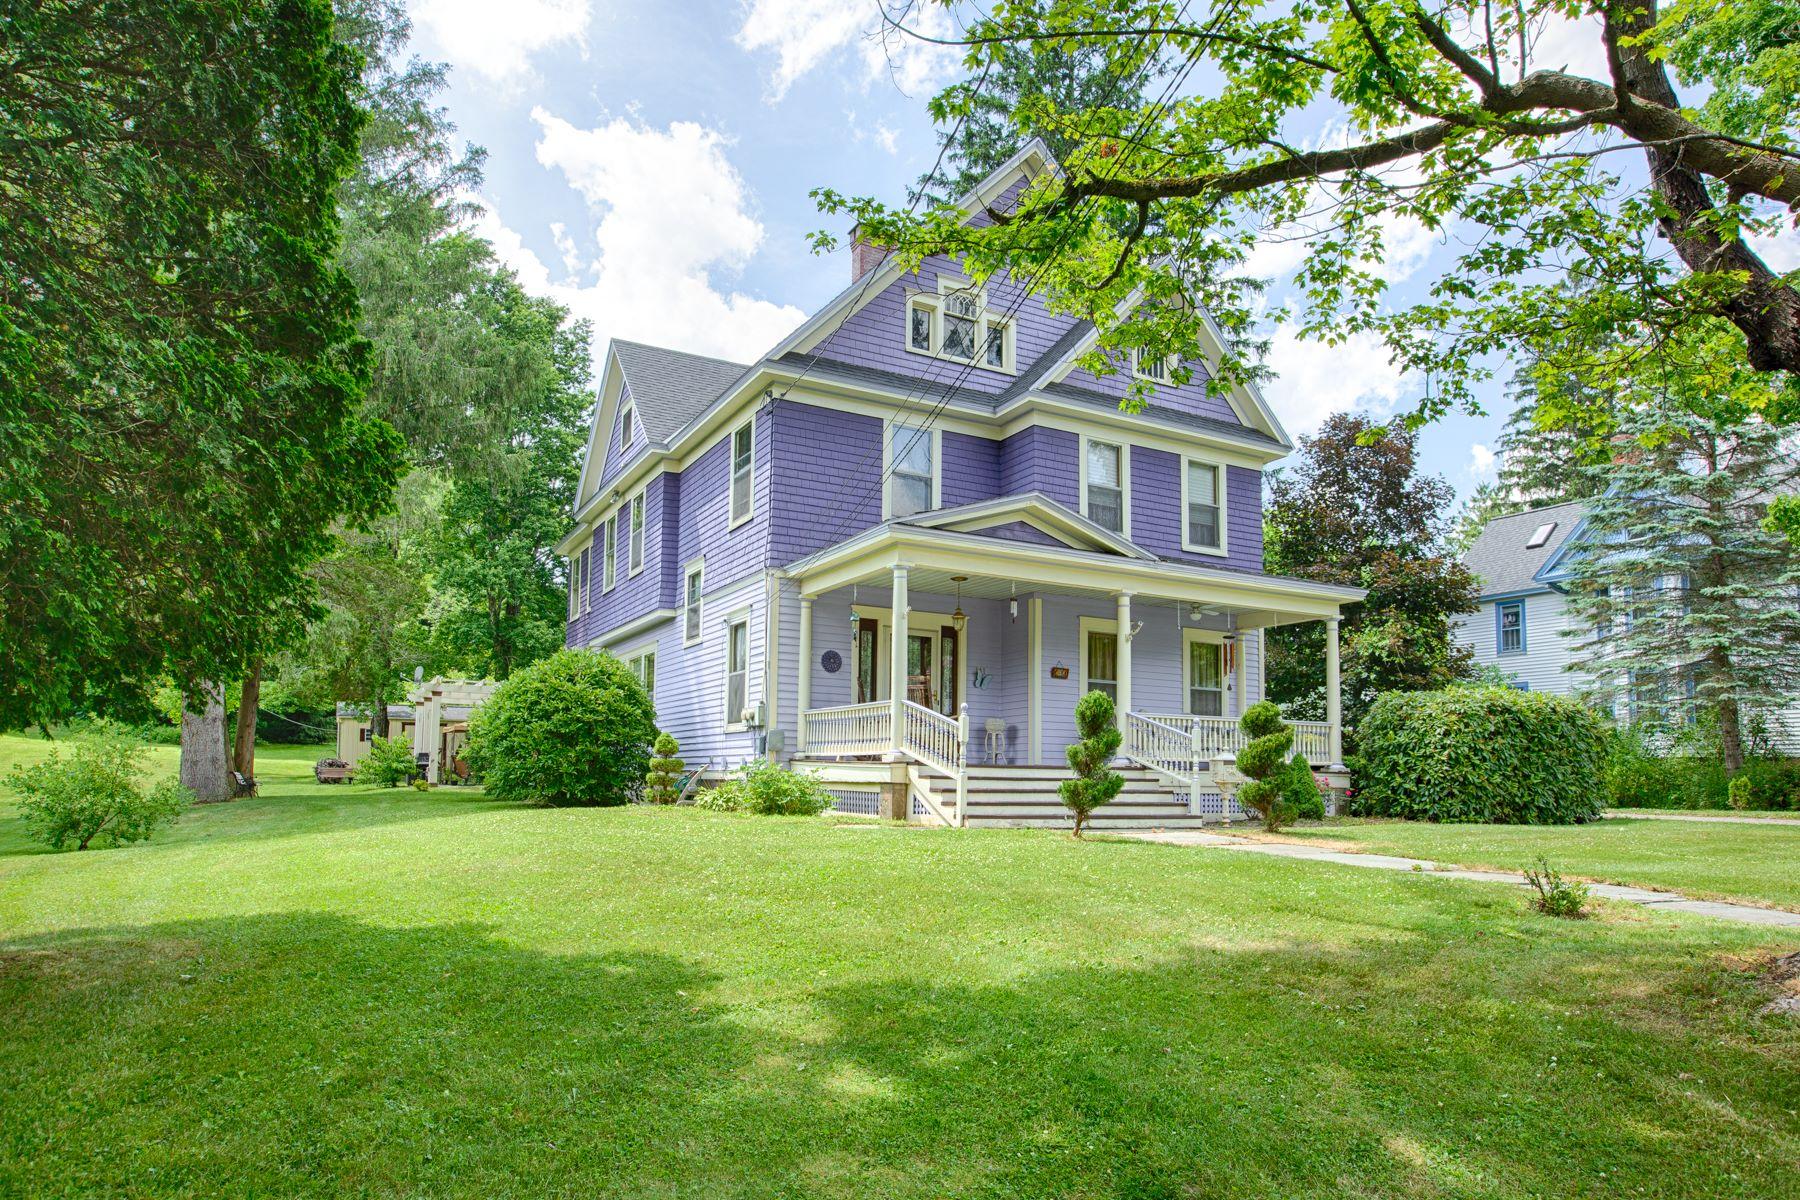 Single Family Homes for Sale at 141 Leonard St, Hancock, Ny, 13783 141 Leonard St Hancock, New York 13783 United States